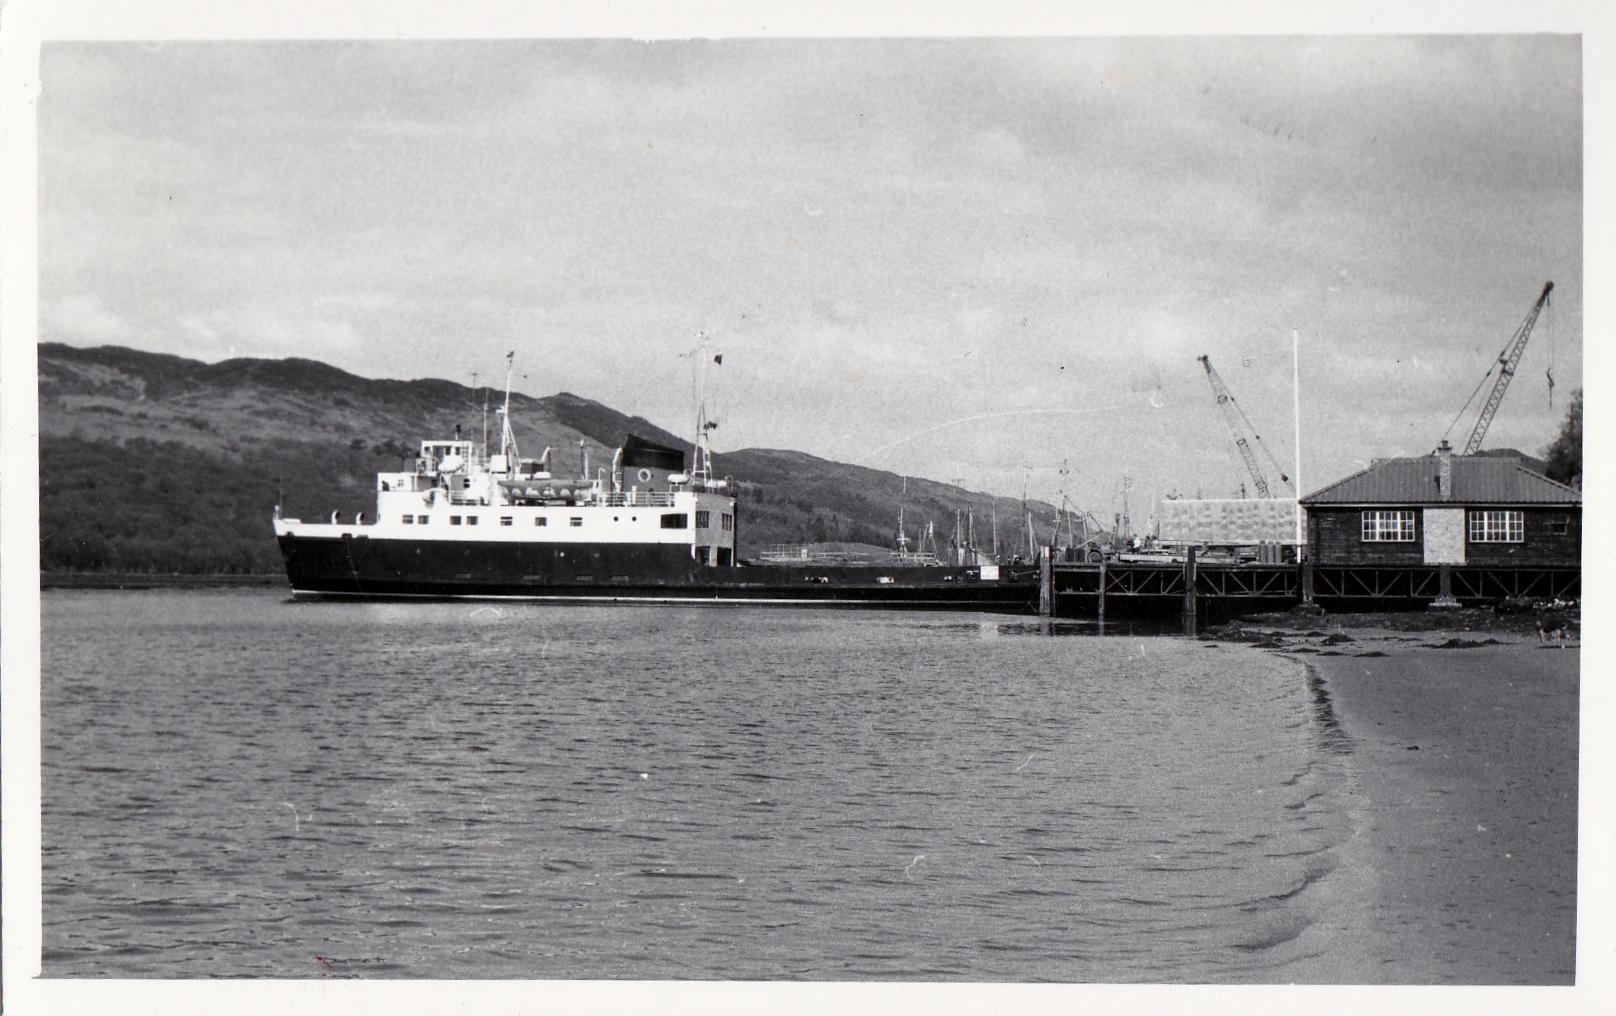 Arran at West Loch Tarbert (Jim Aikman Smith)